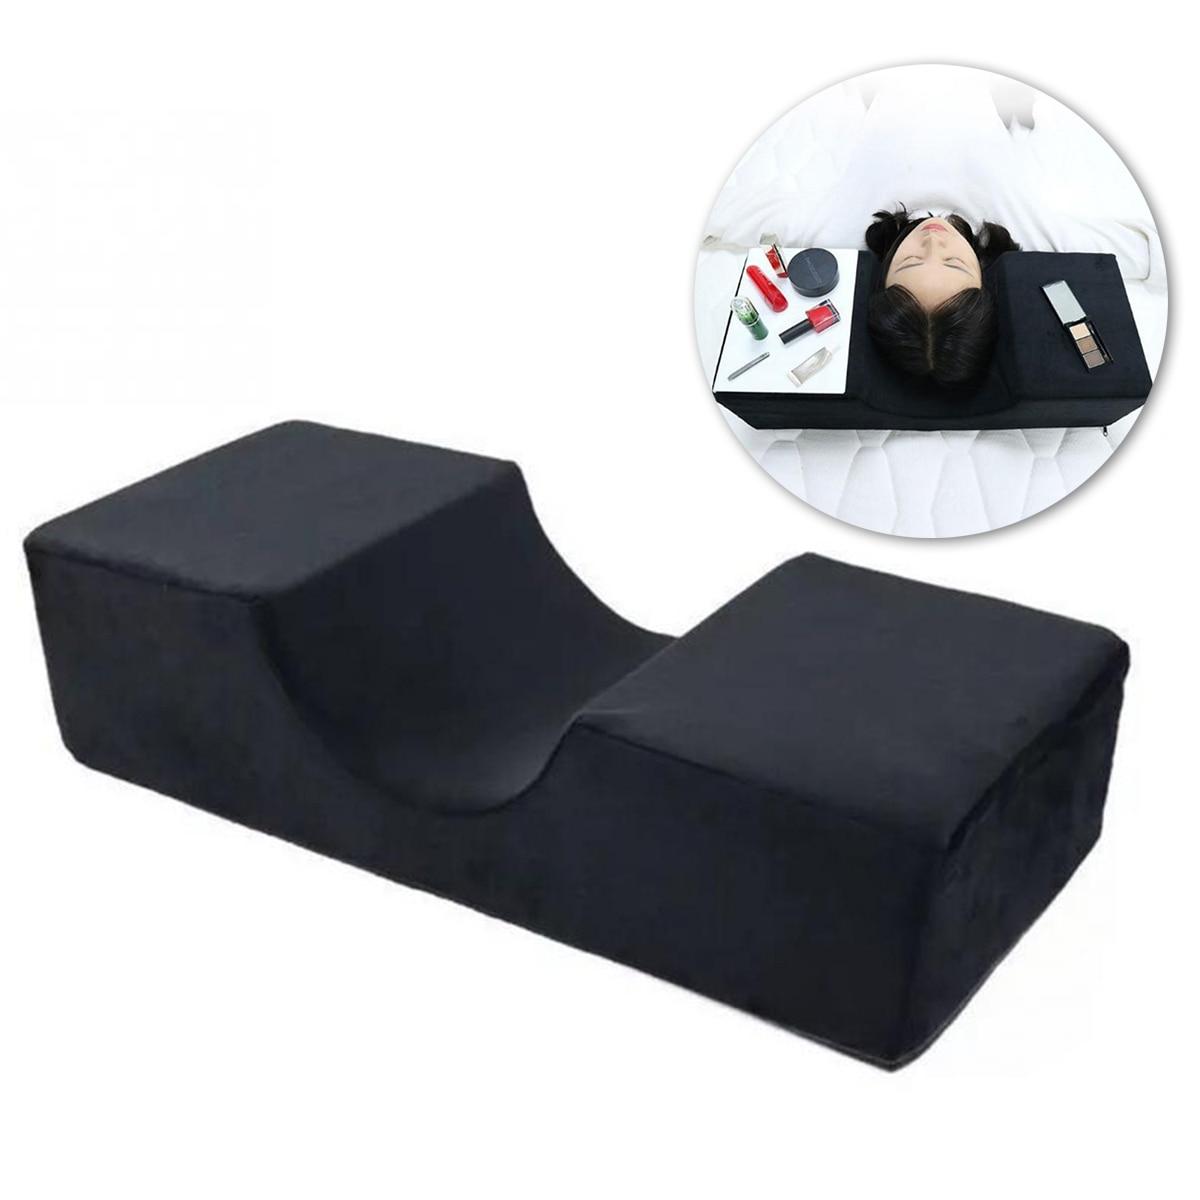 Extensiones de almohada de pestañas profesionales Nosii, franela especial para uso en salón, soporte de belleza de memoria, injertado para extensión de pestañas, reposacabezas